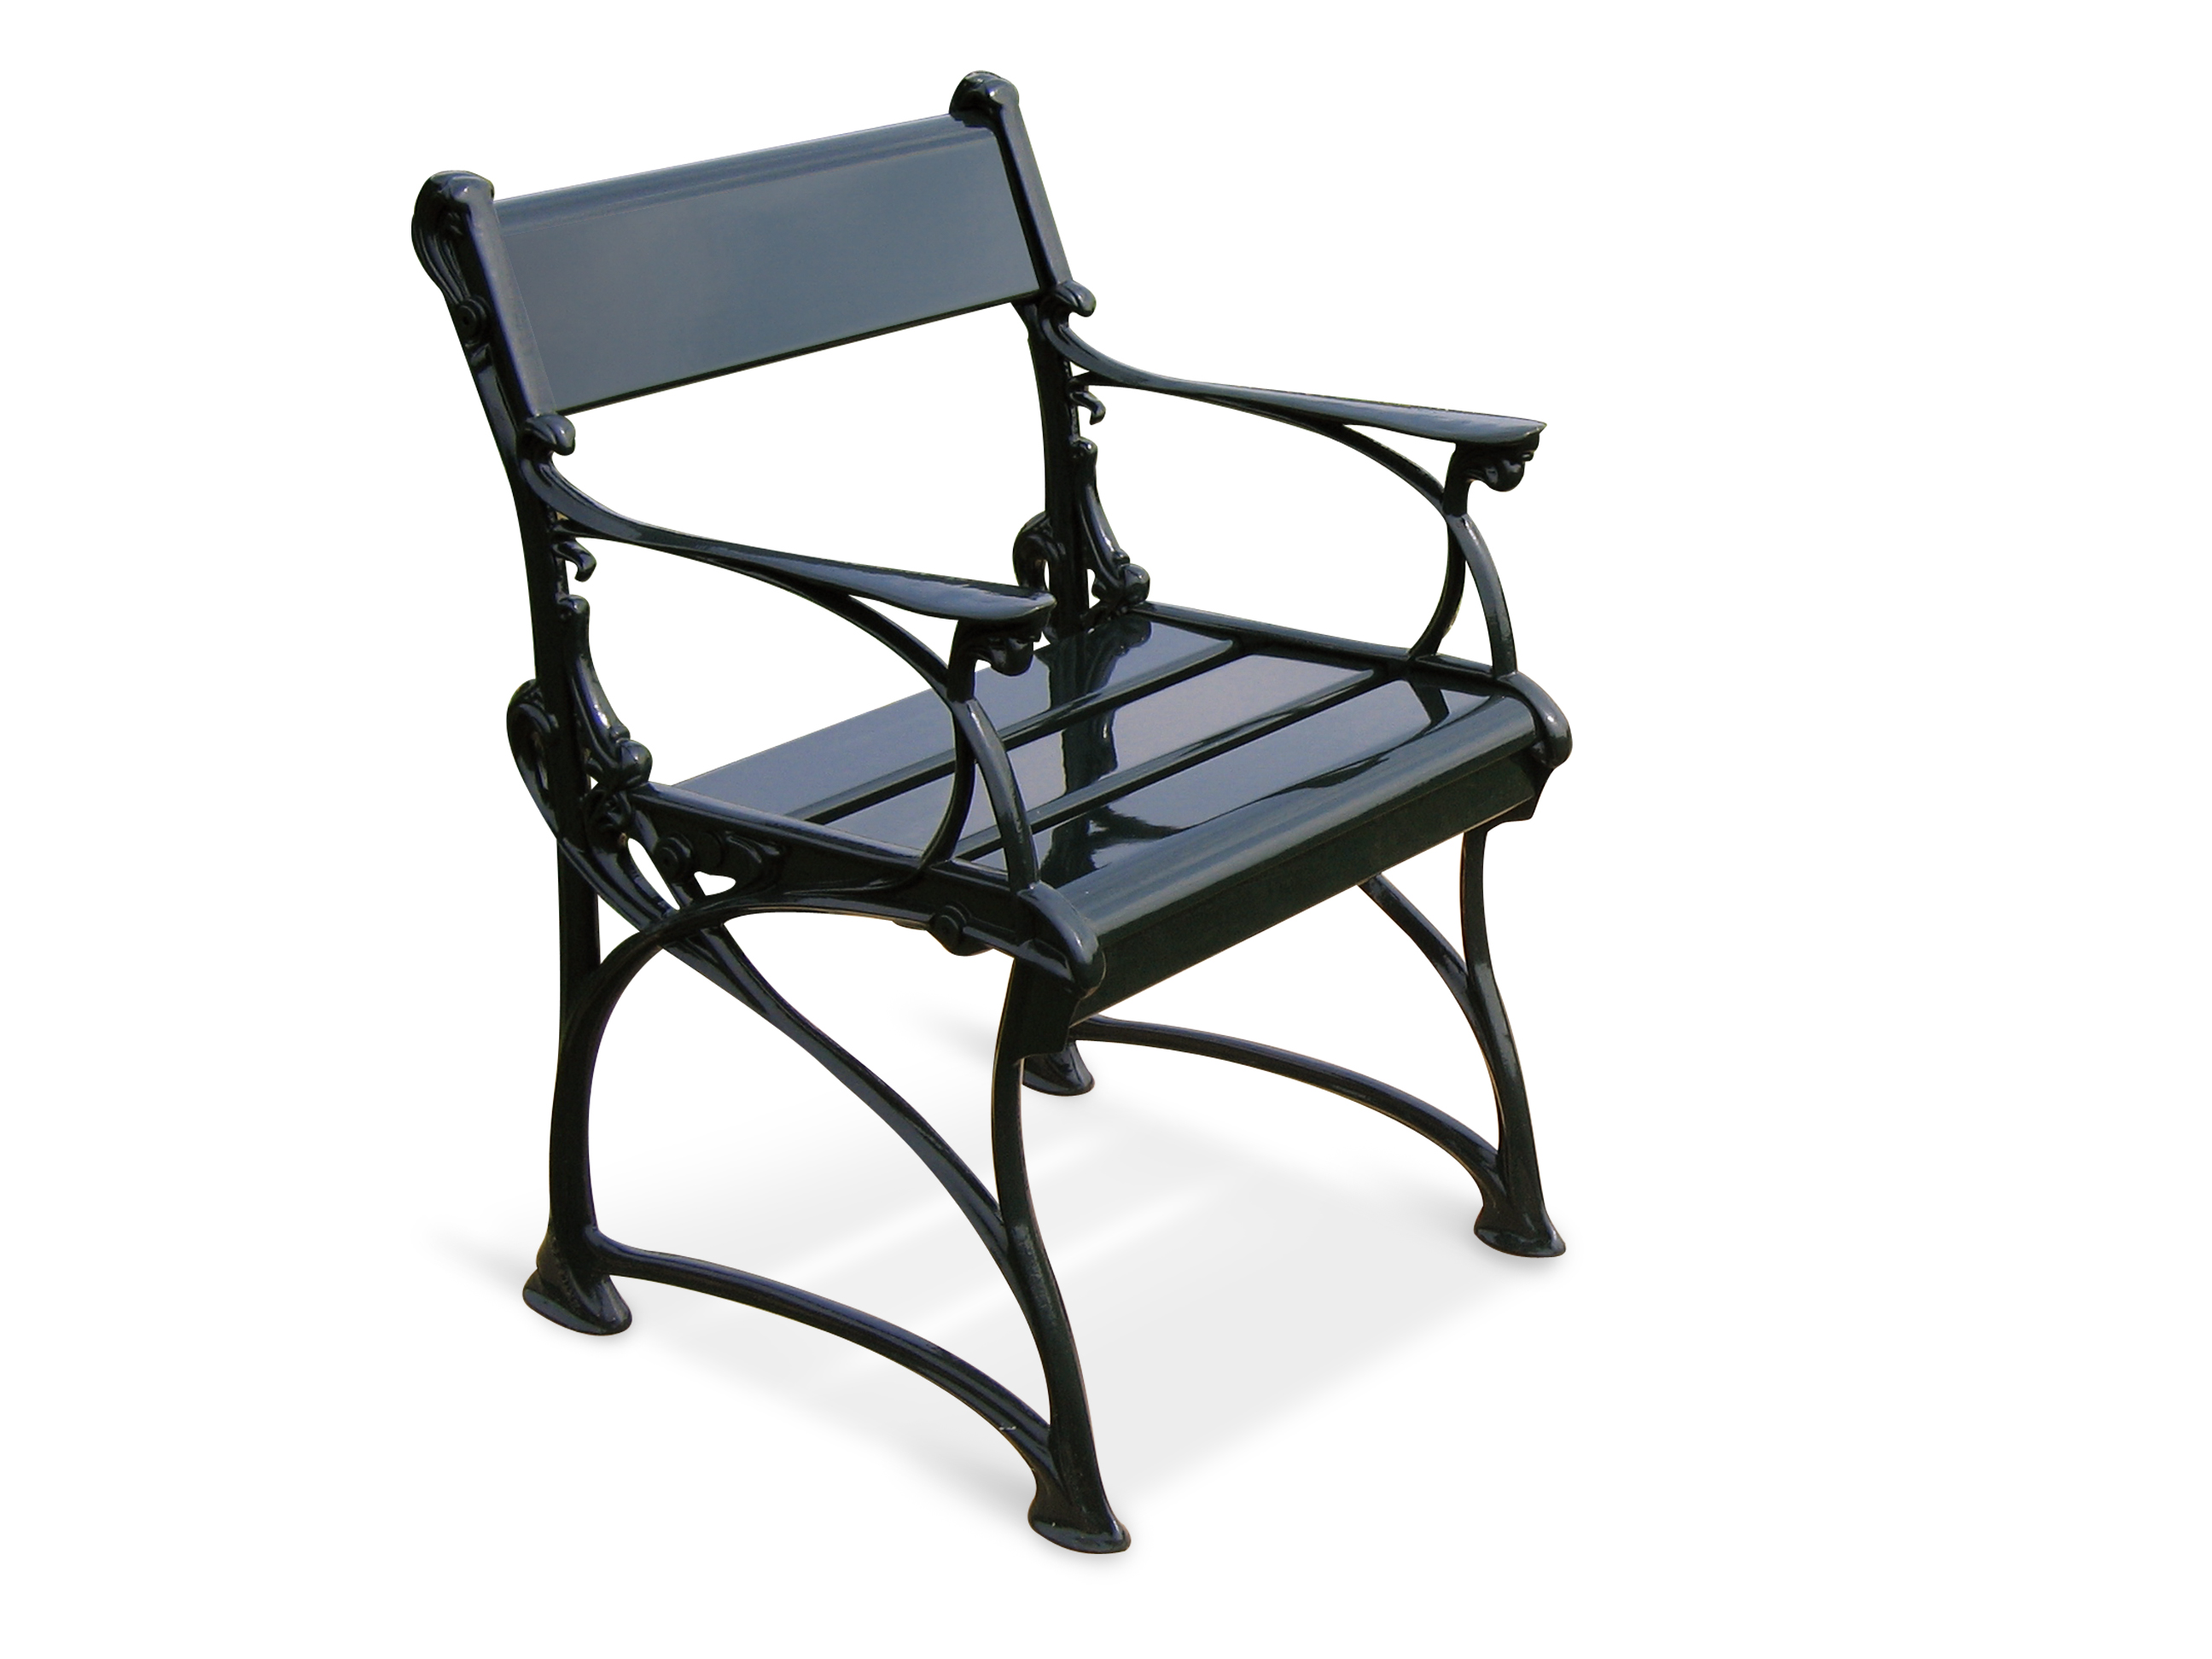 gardeluxe gartenbank demeter 200 cm jugendstil stil zierlich wetterfest. Black Bedroom Furniture Sets. Home Design Ideas